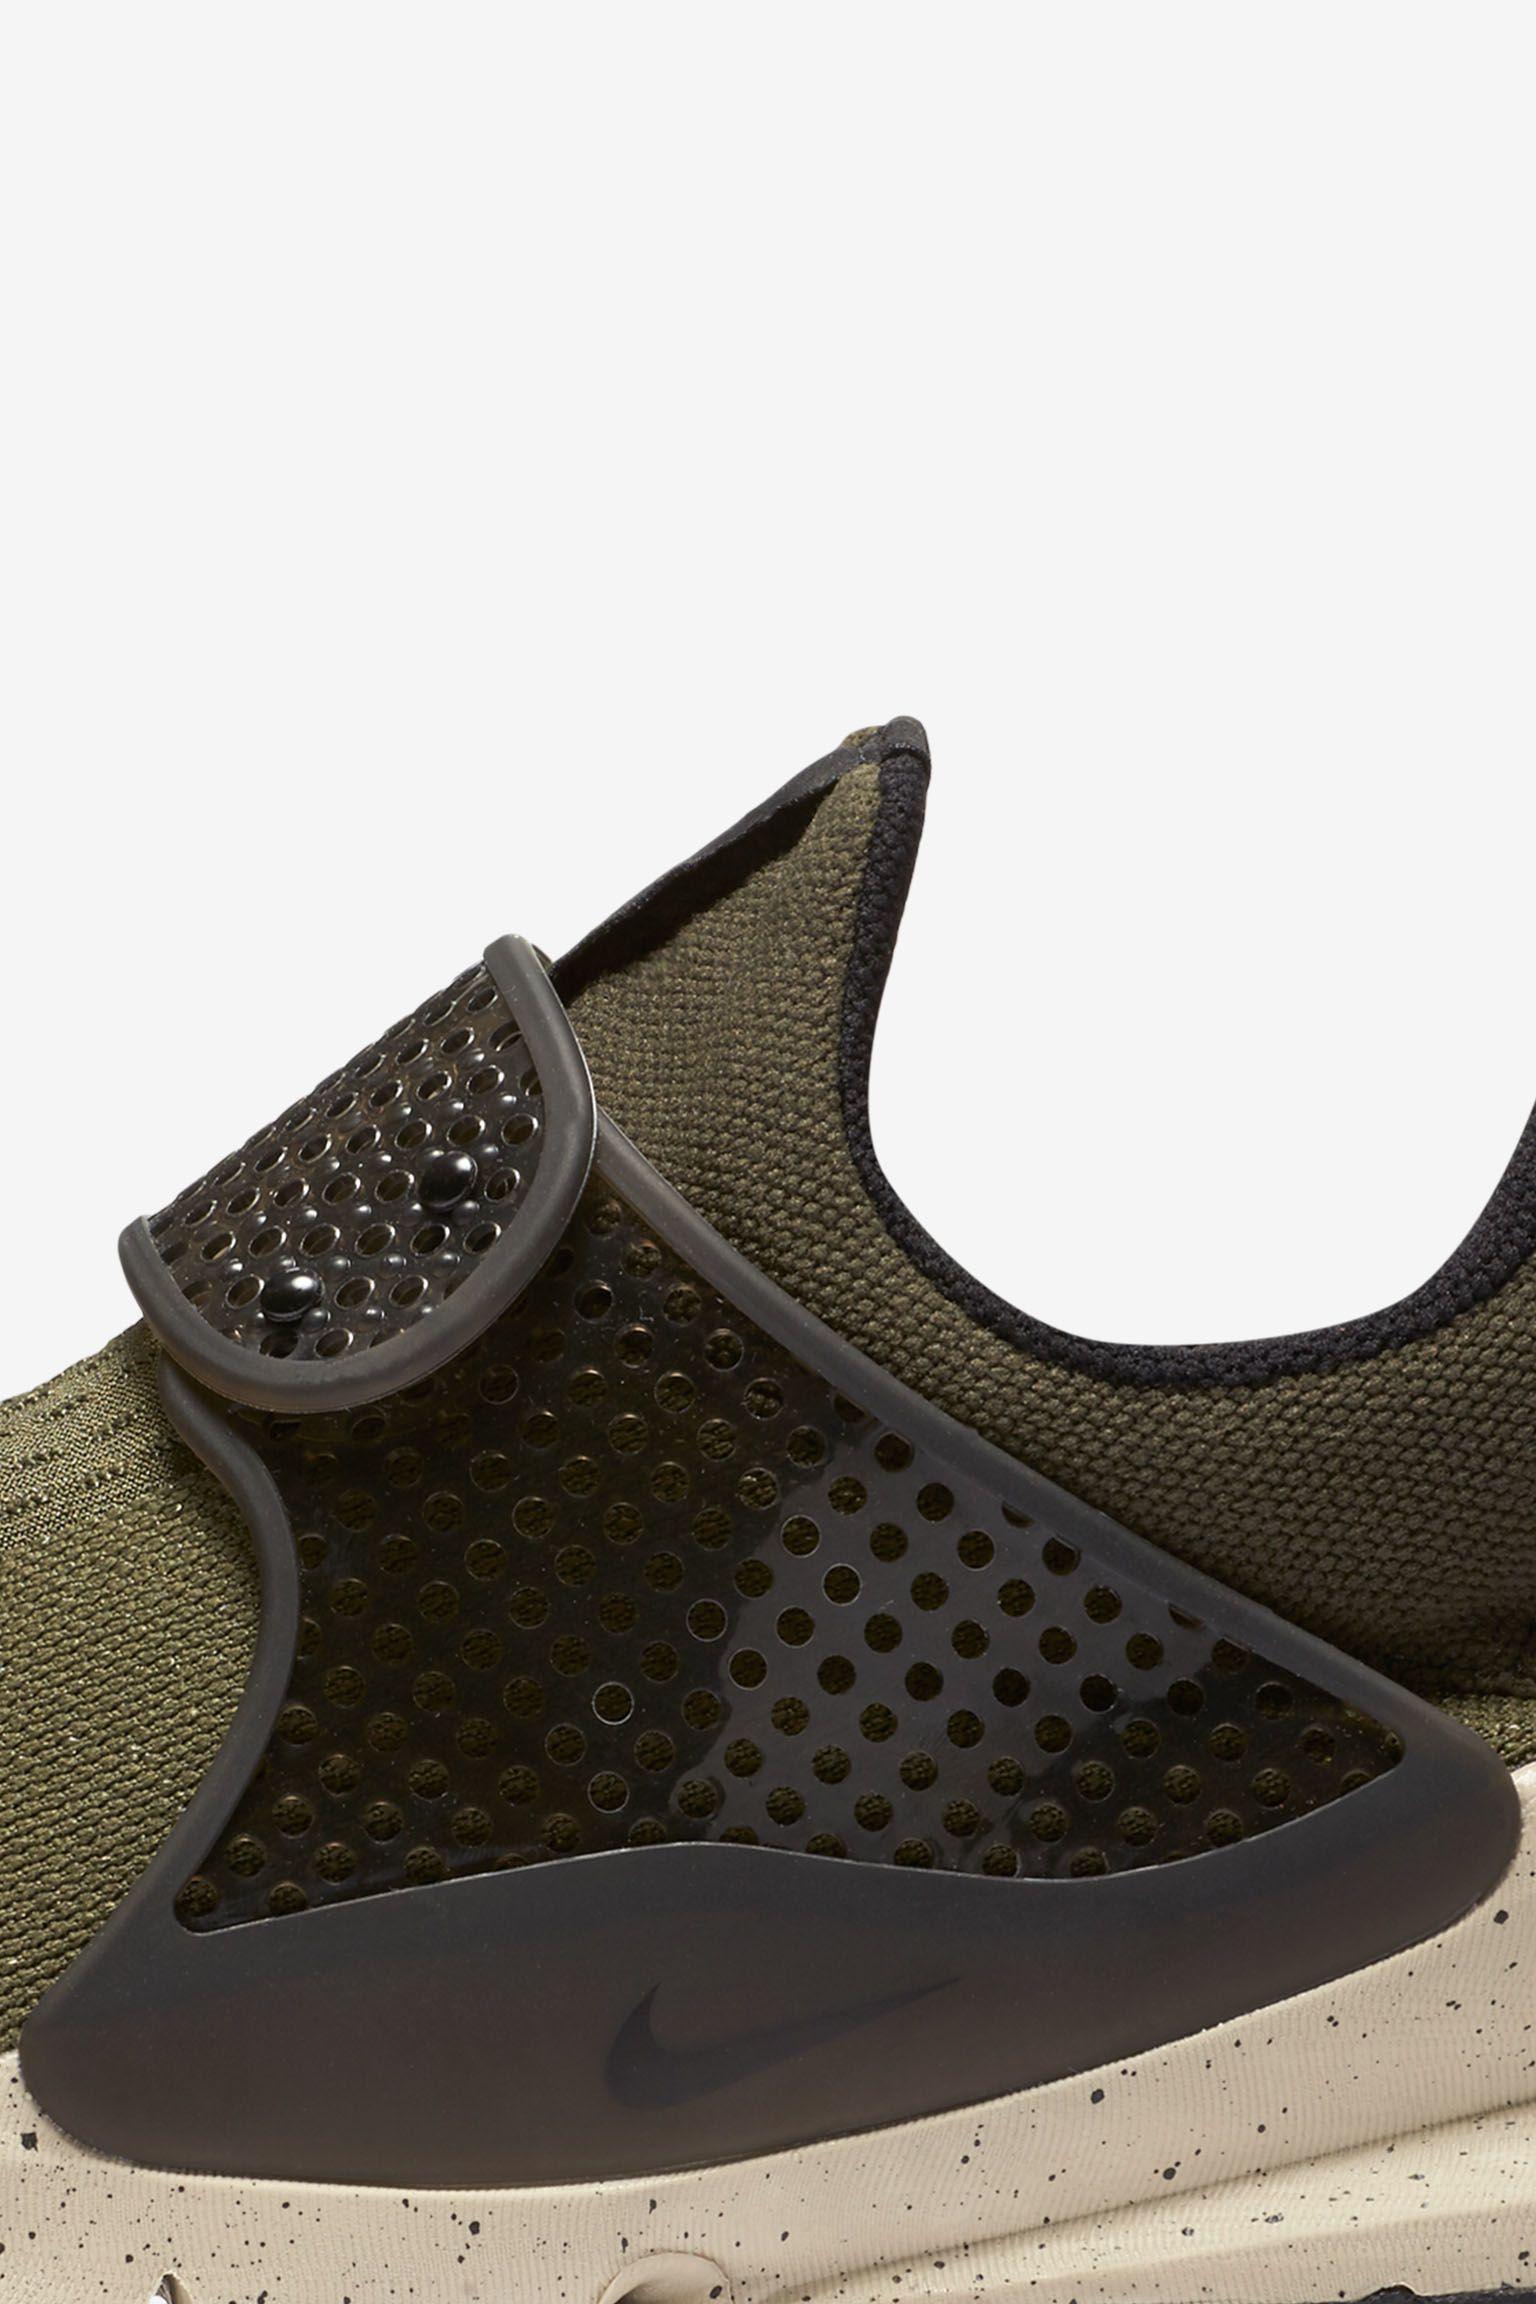 Nike Sock Dart 'Cargo Khaki' Release Date